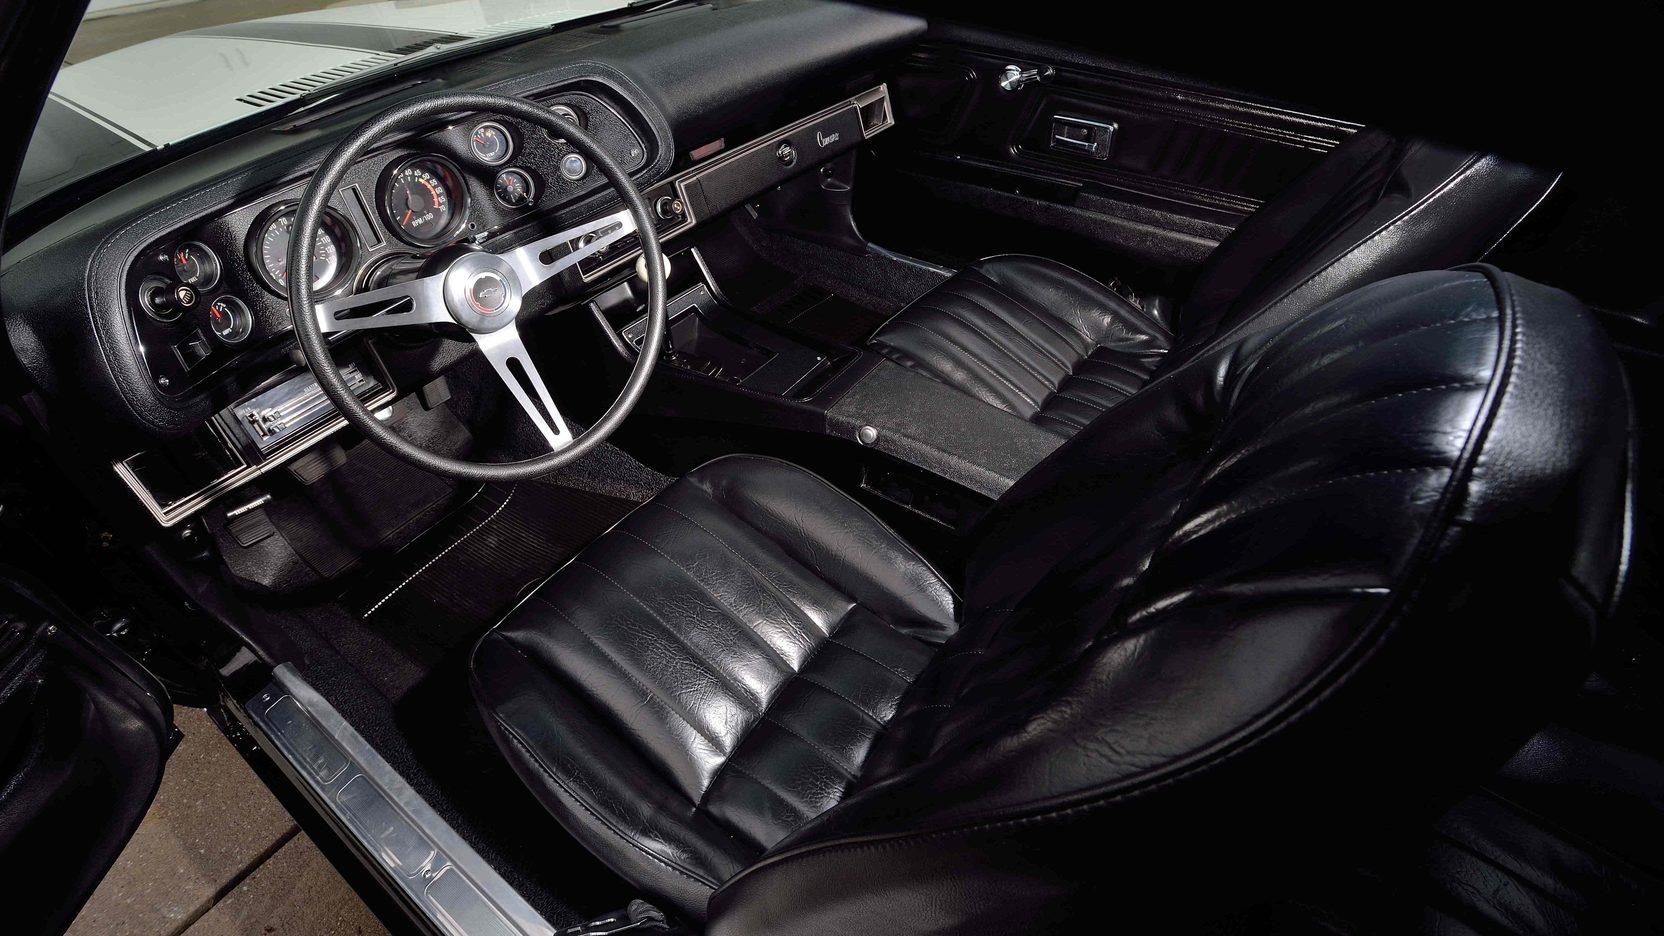 1972 Chevrolet Camaro Z28 interior